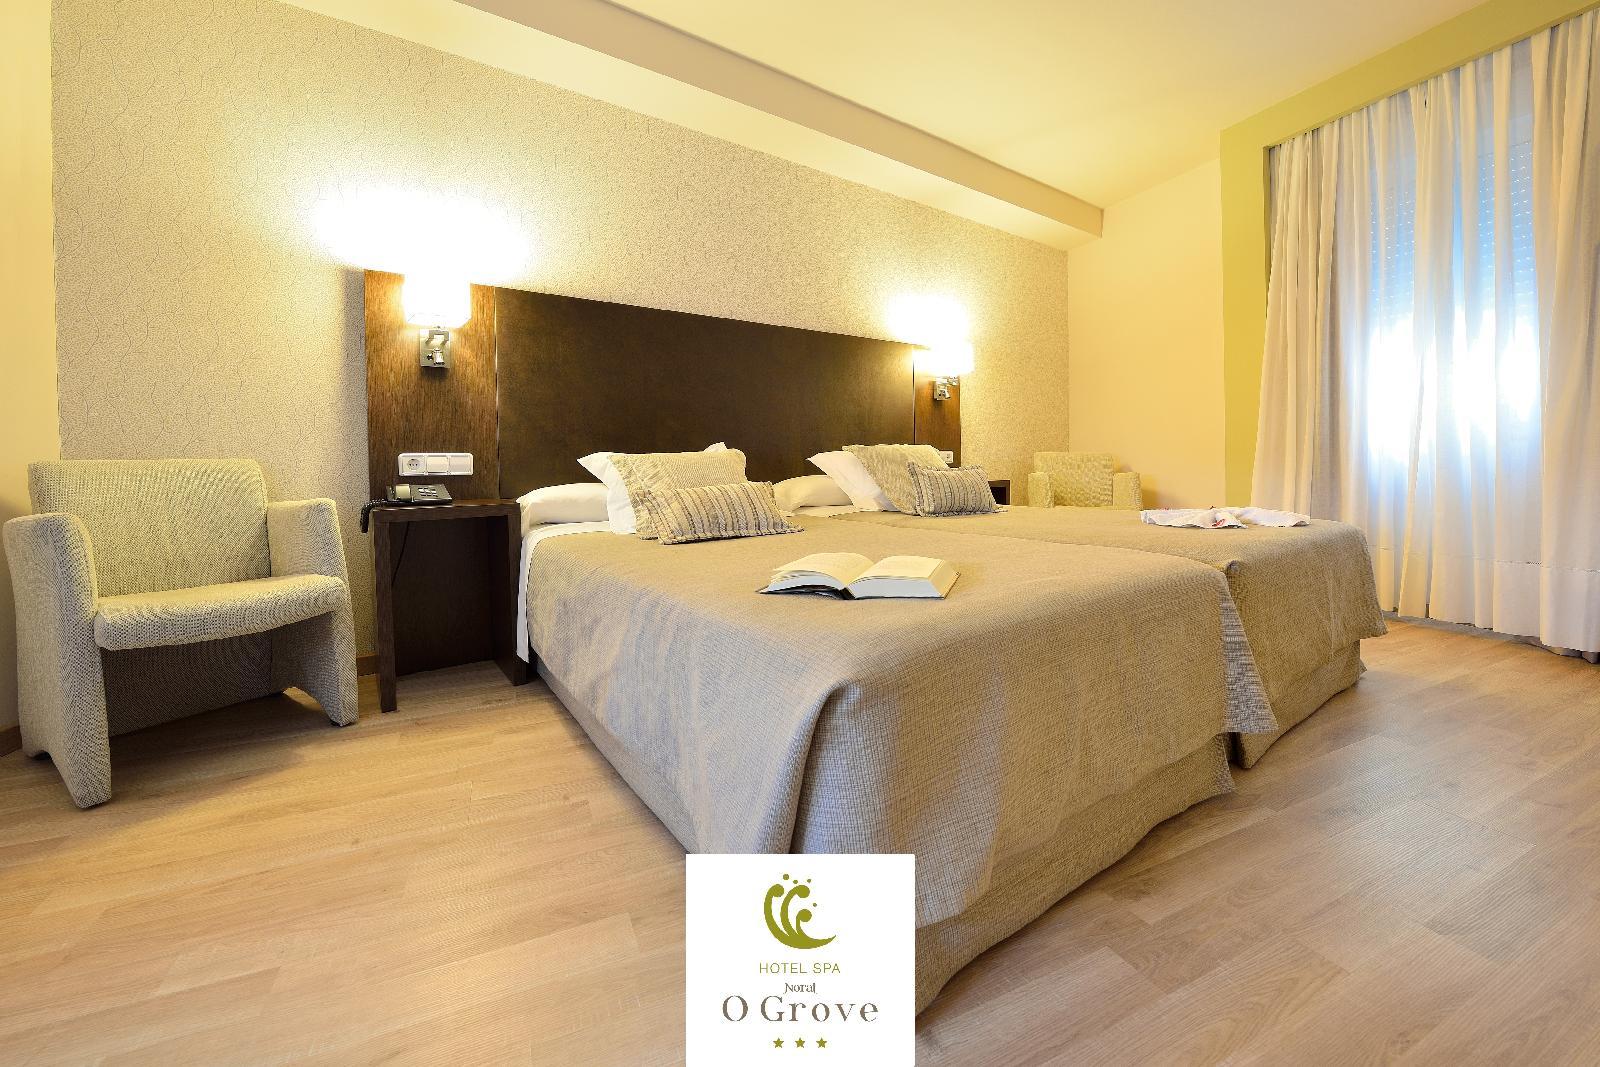 9. Hotel Spa Norat O Grove